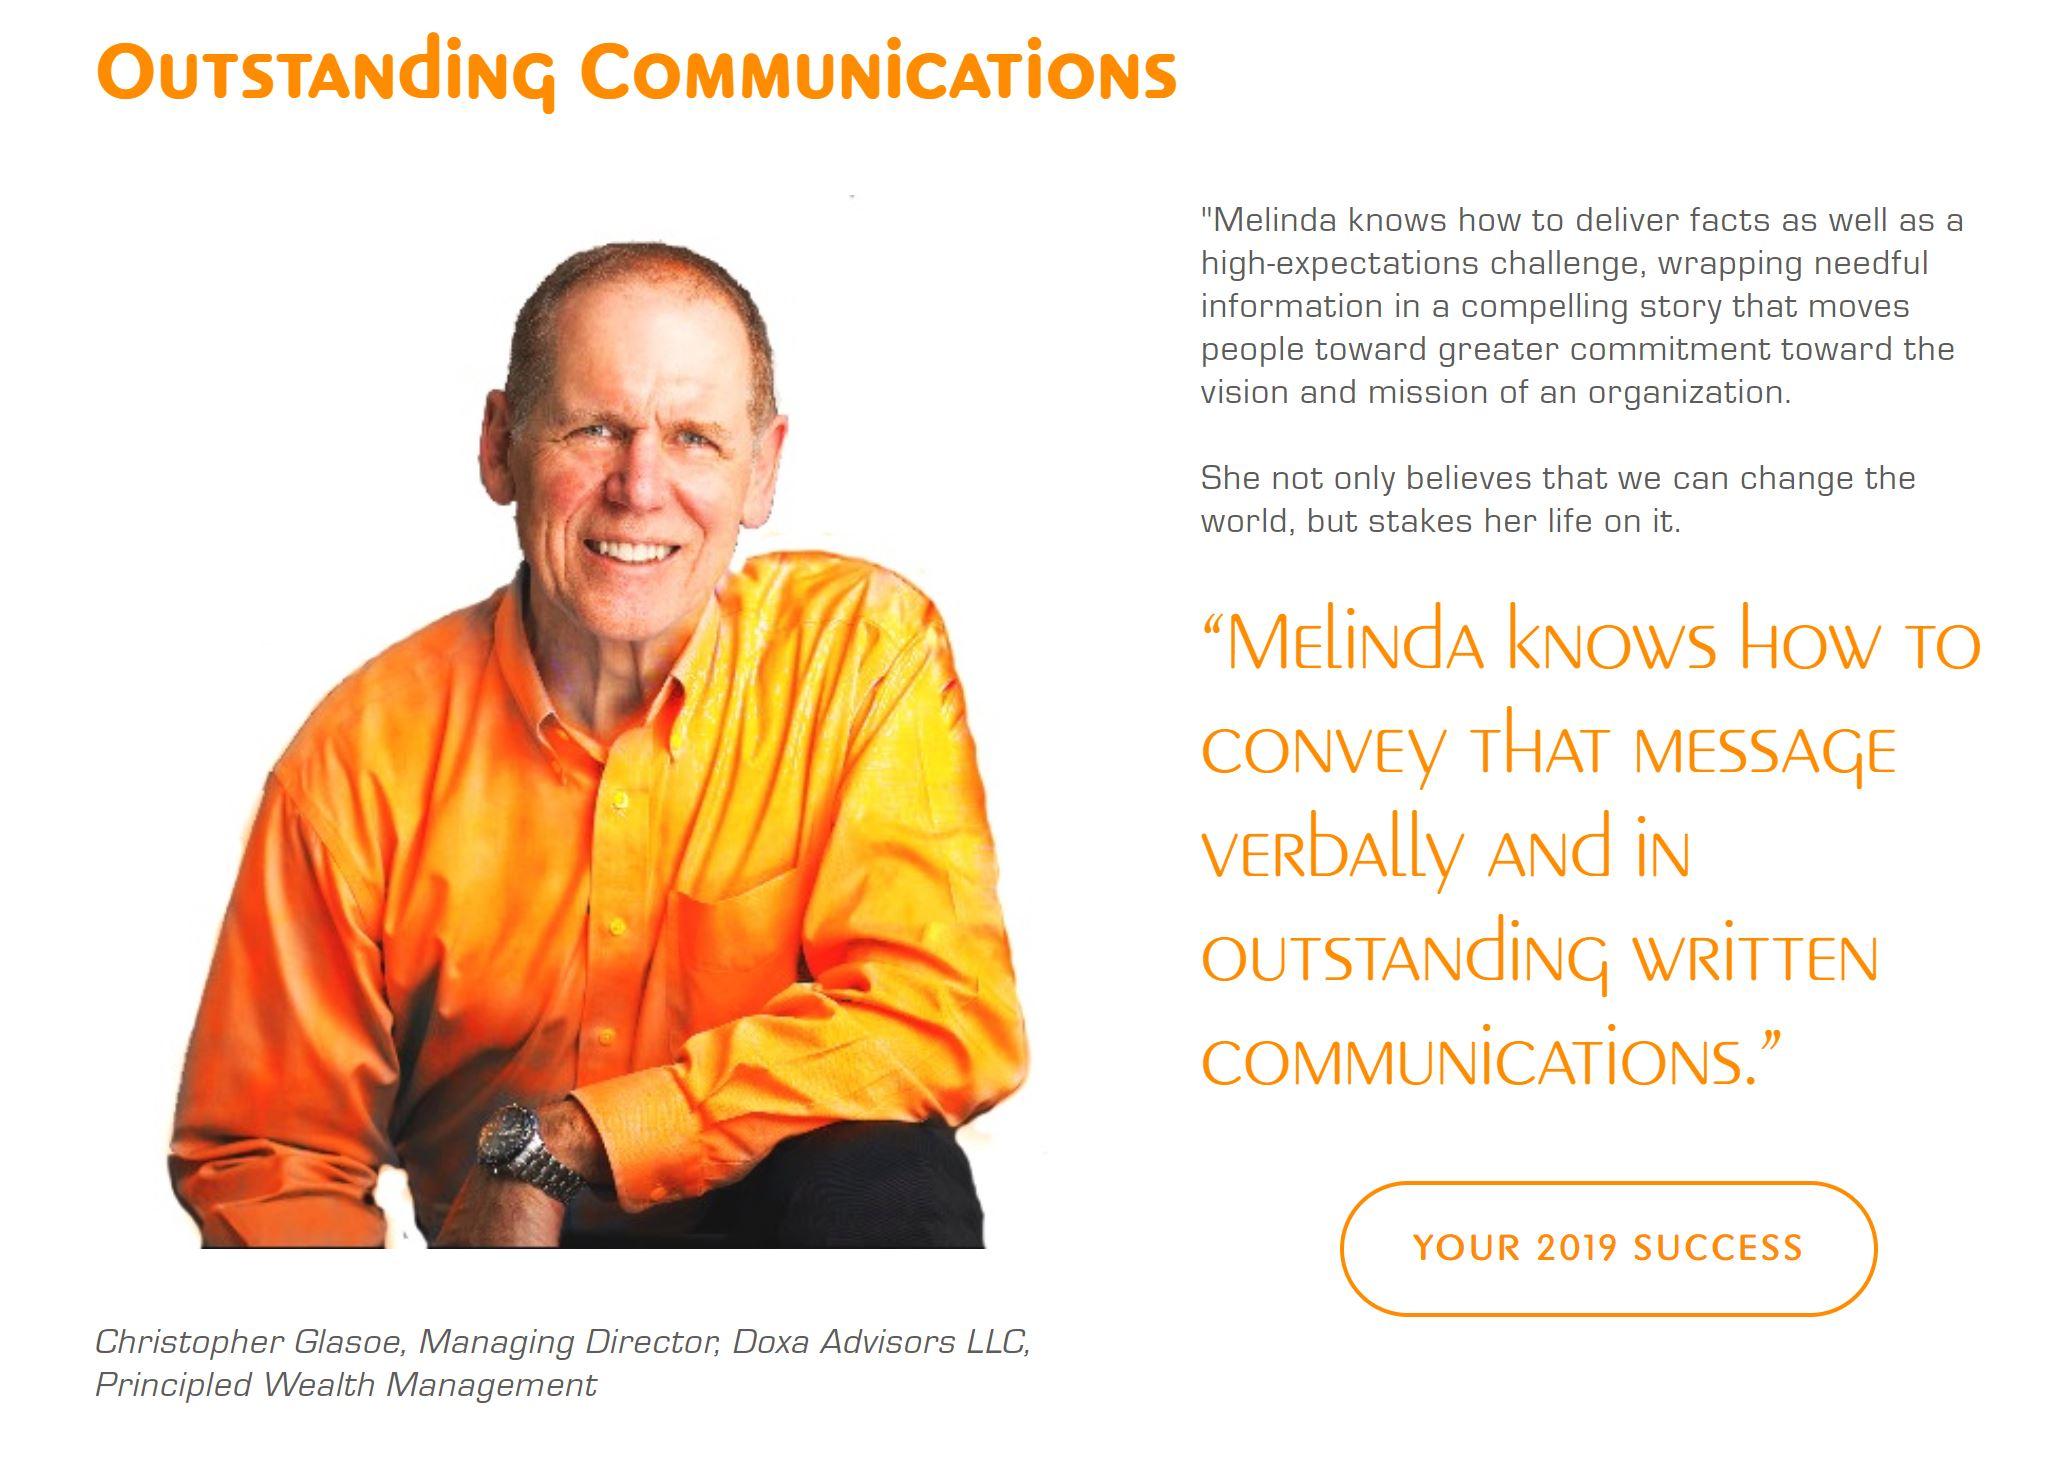 Communications Strategist & Digital Design